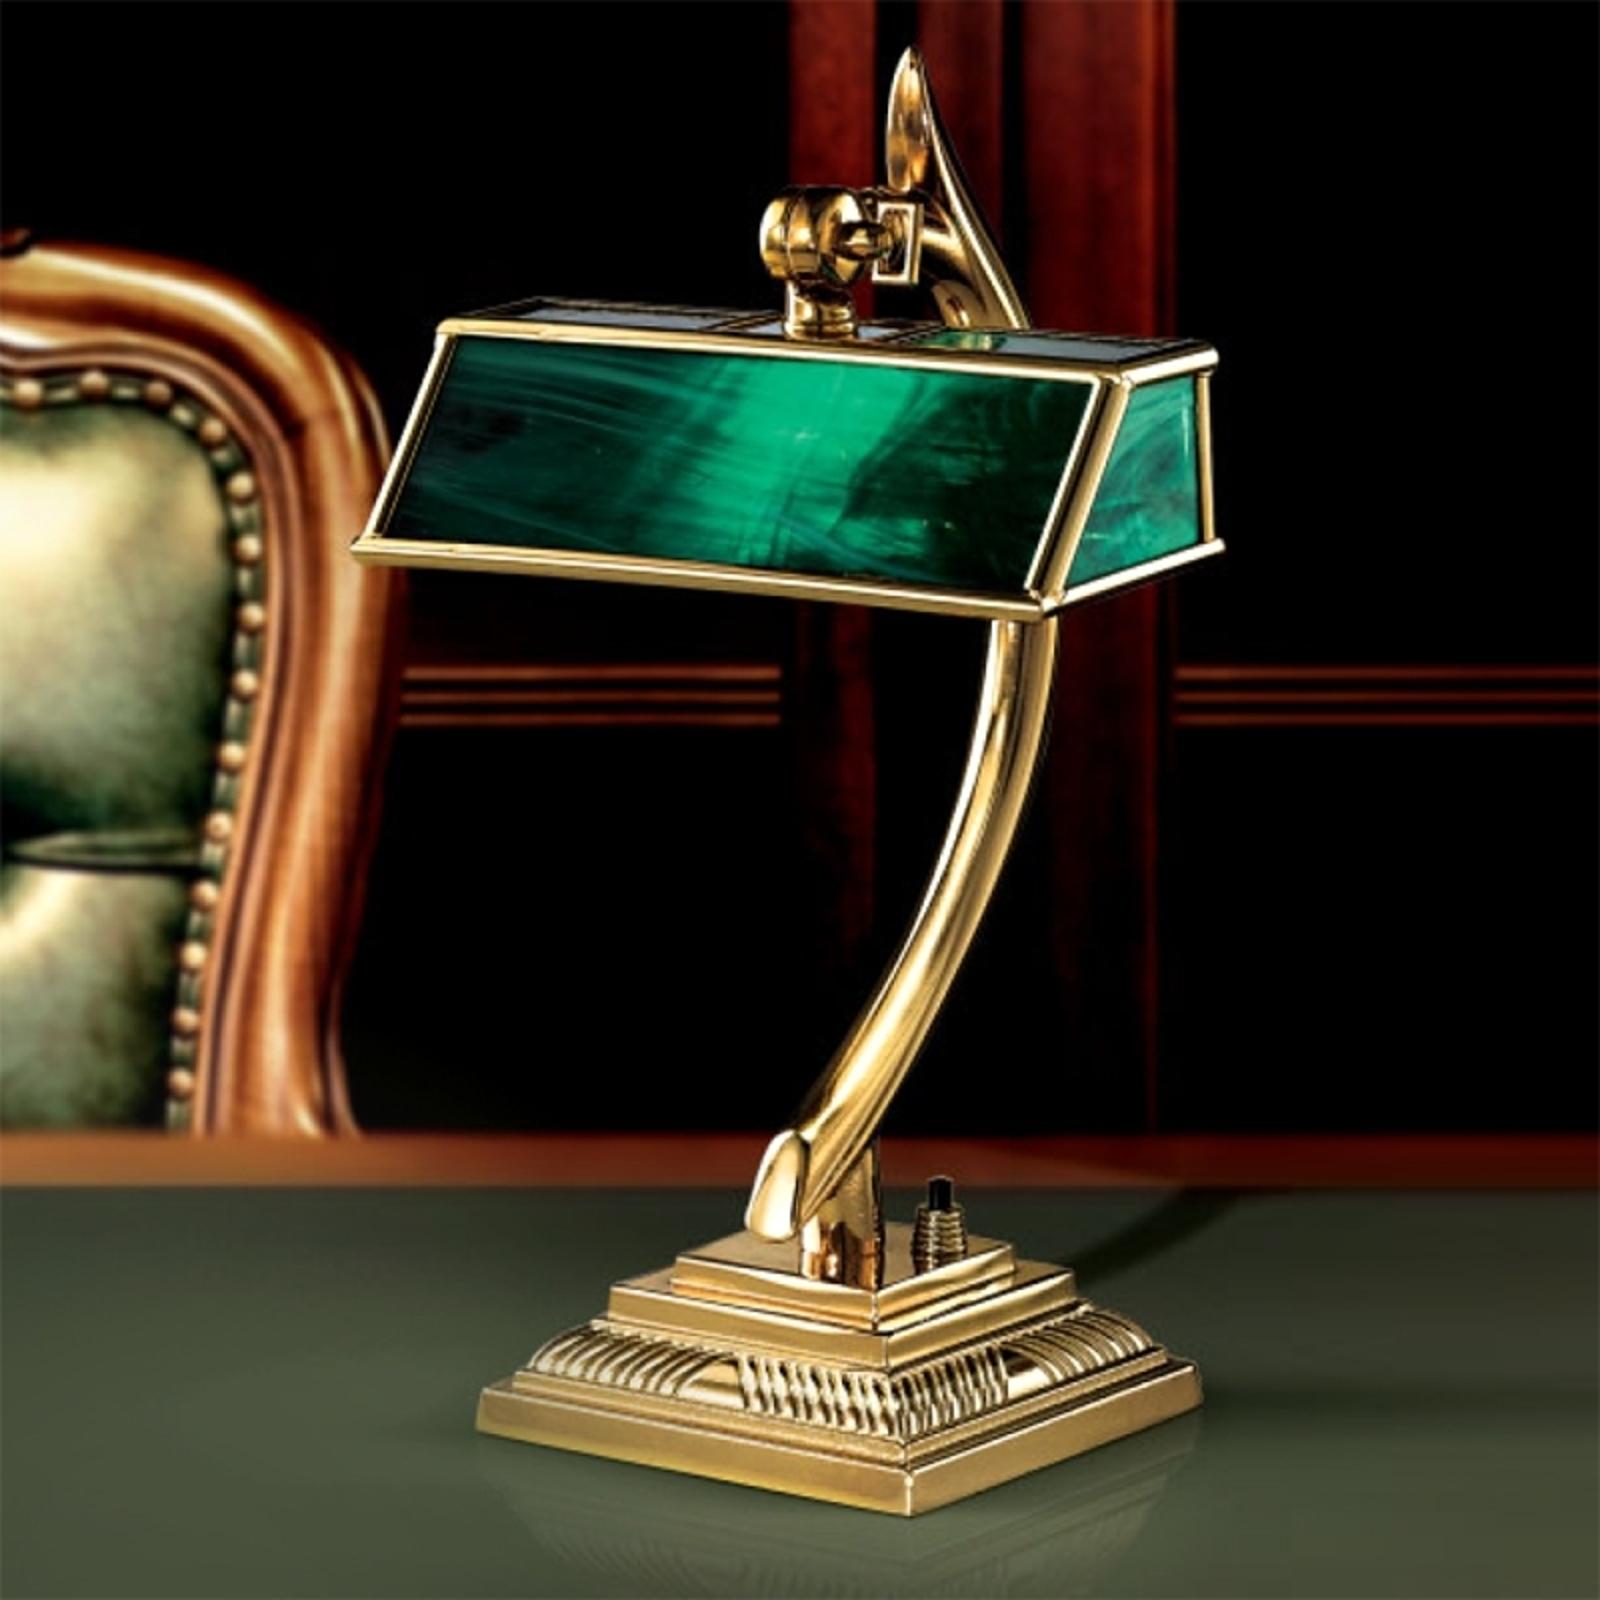 Repræsentativ Antiko bordlampe